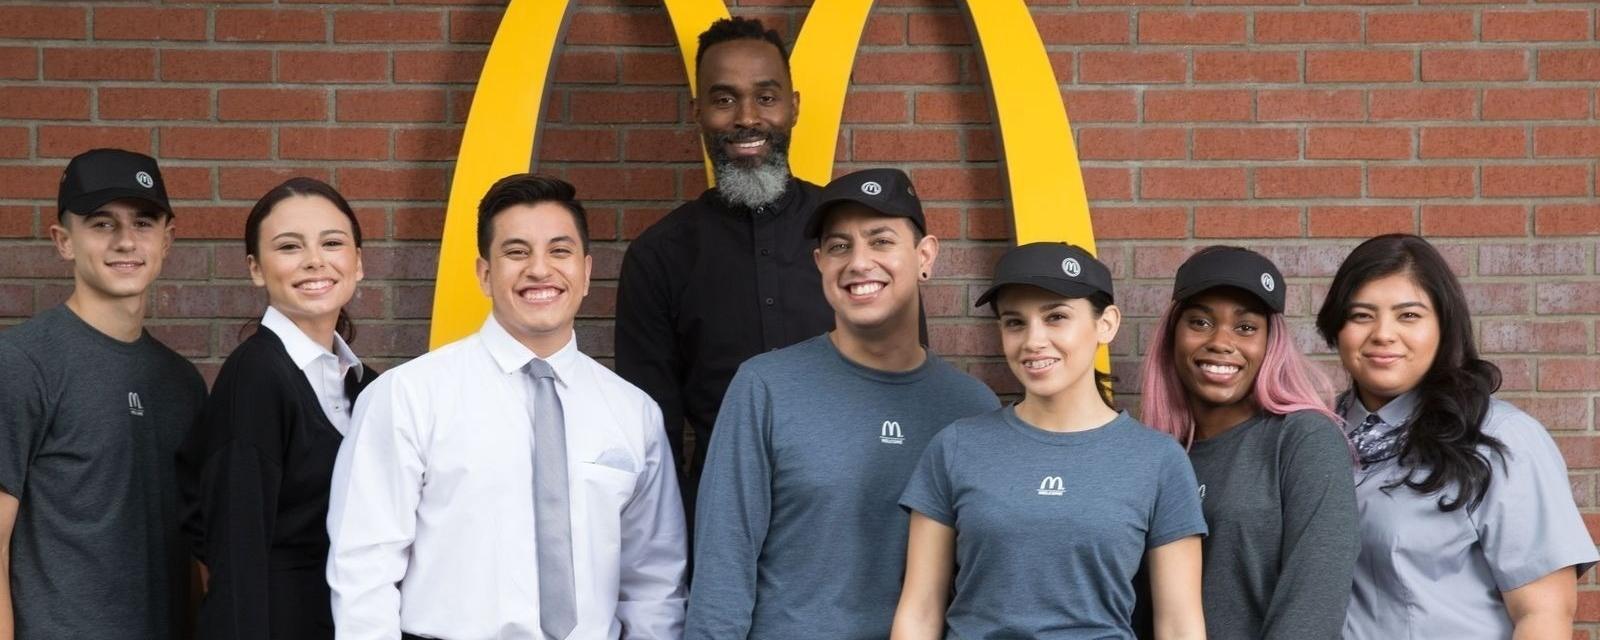 010074 Grand St. NJ McDonald's Brand Cover